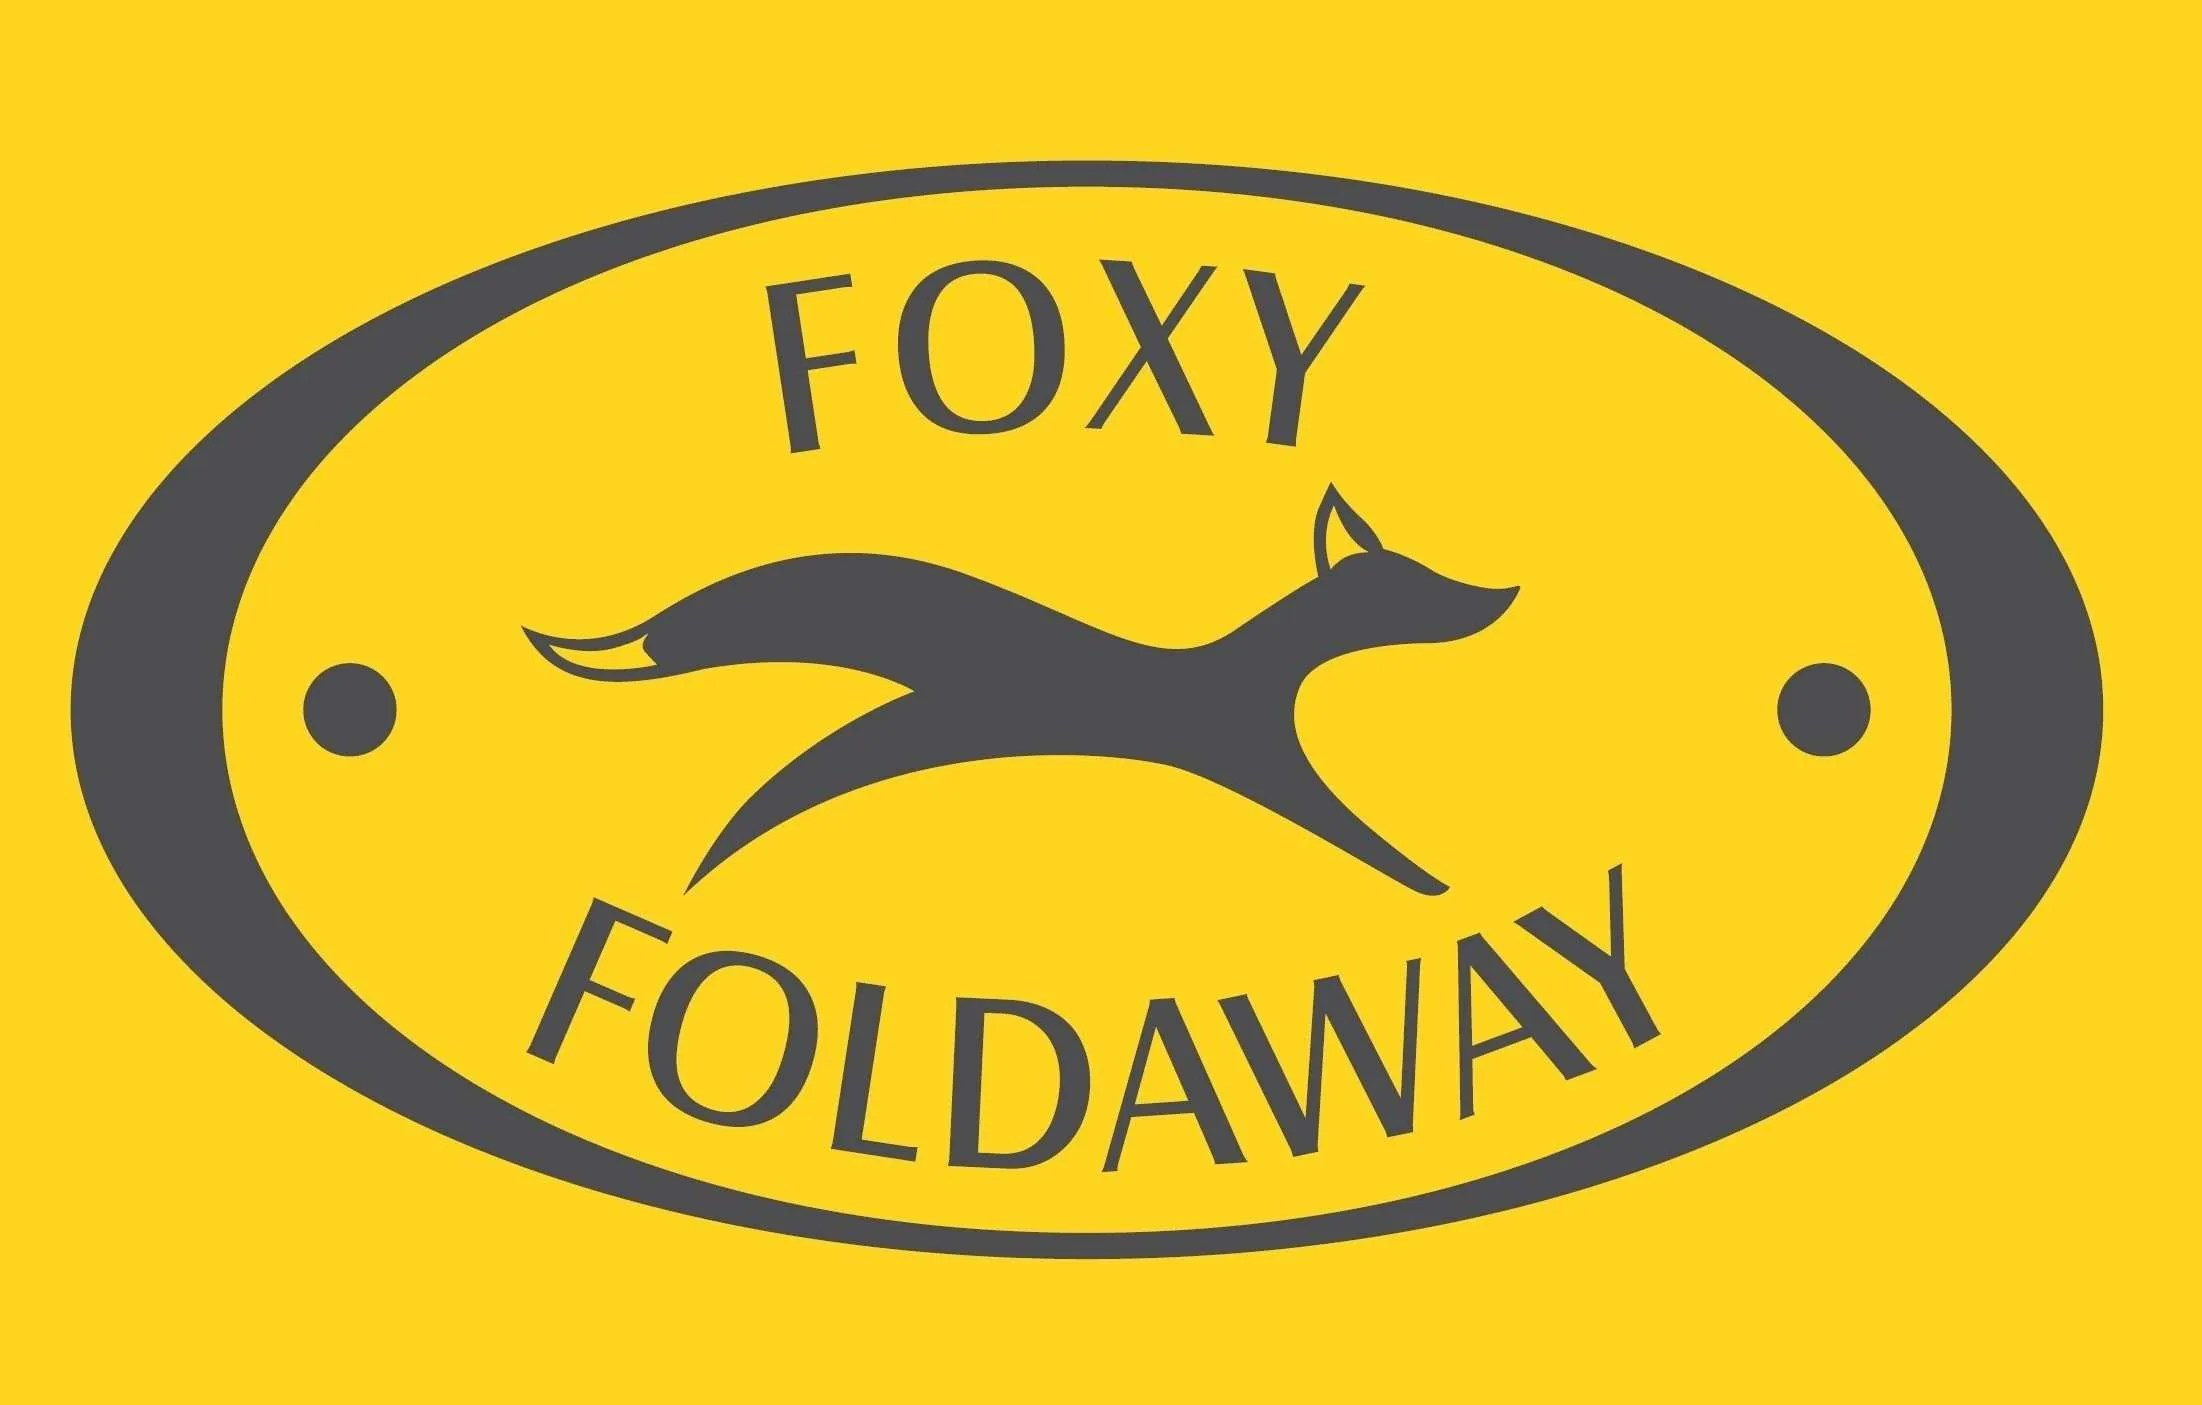 Foxy Foldaway